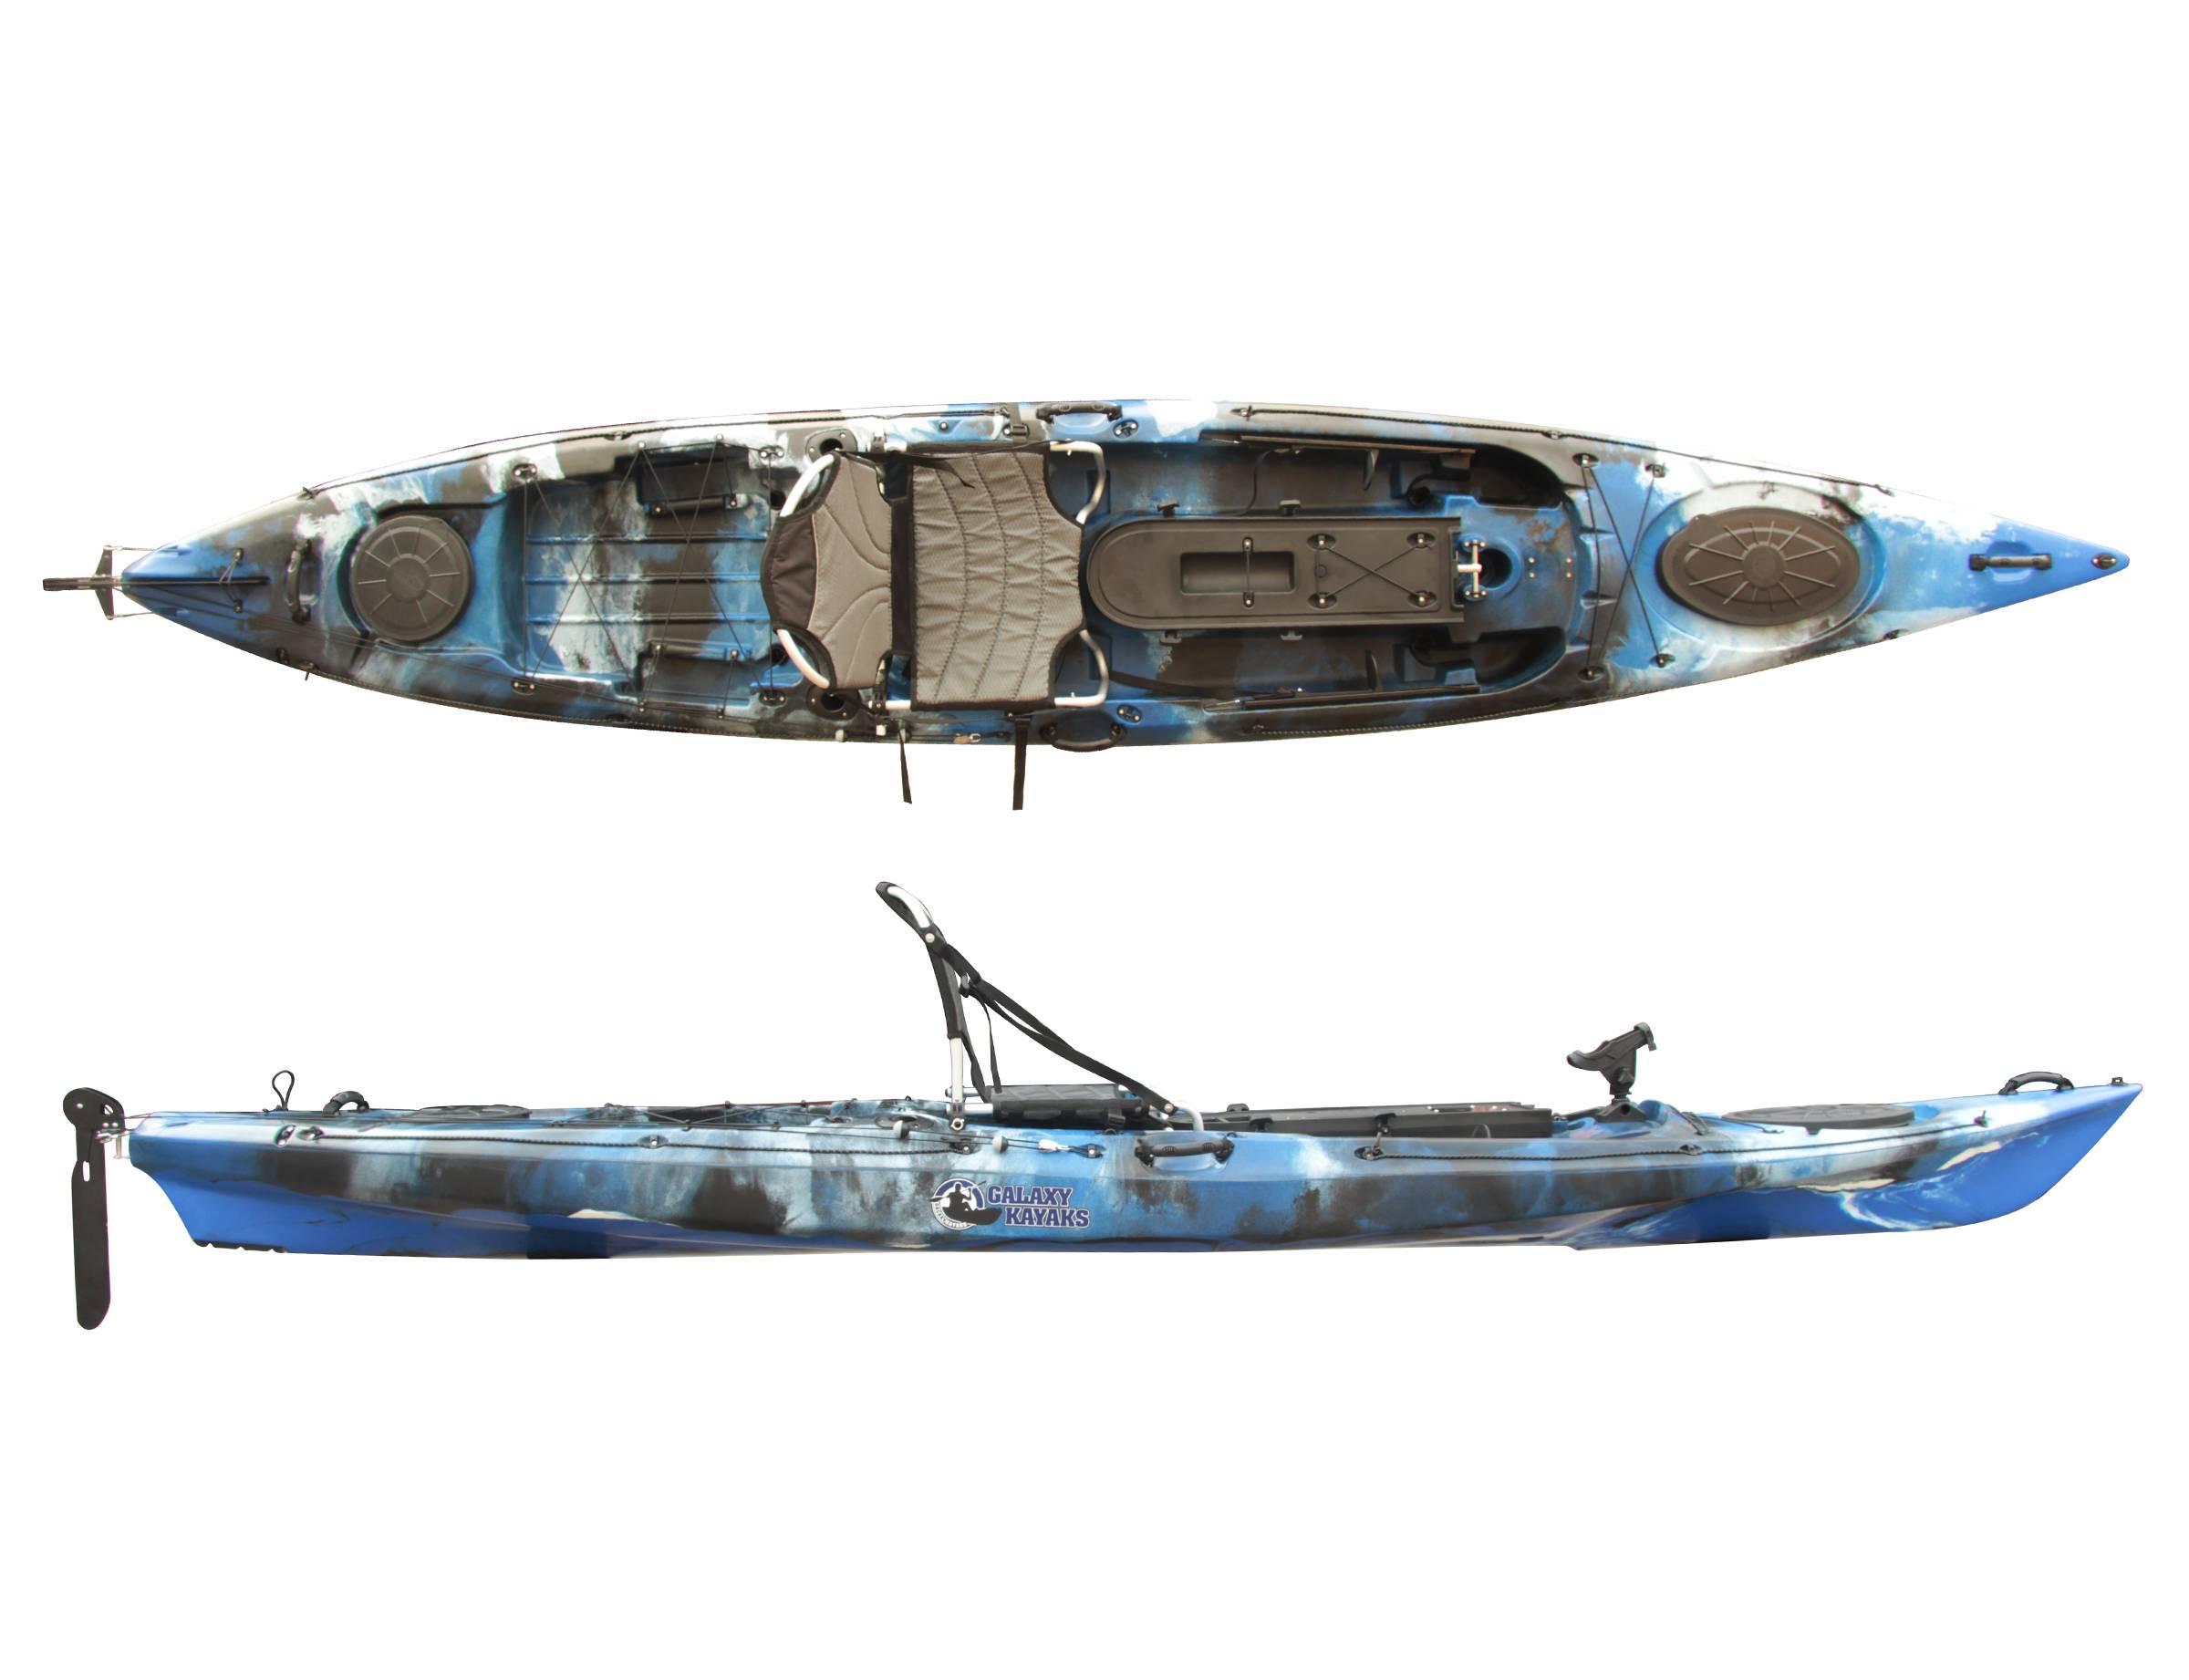 Marlin 430